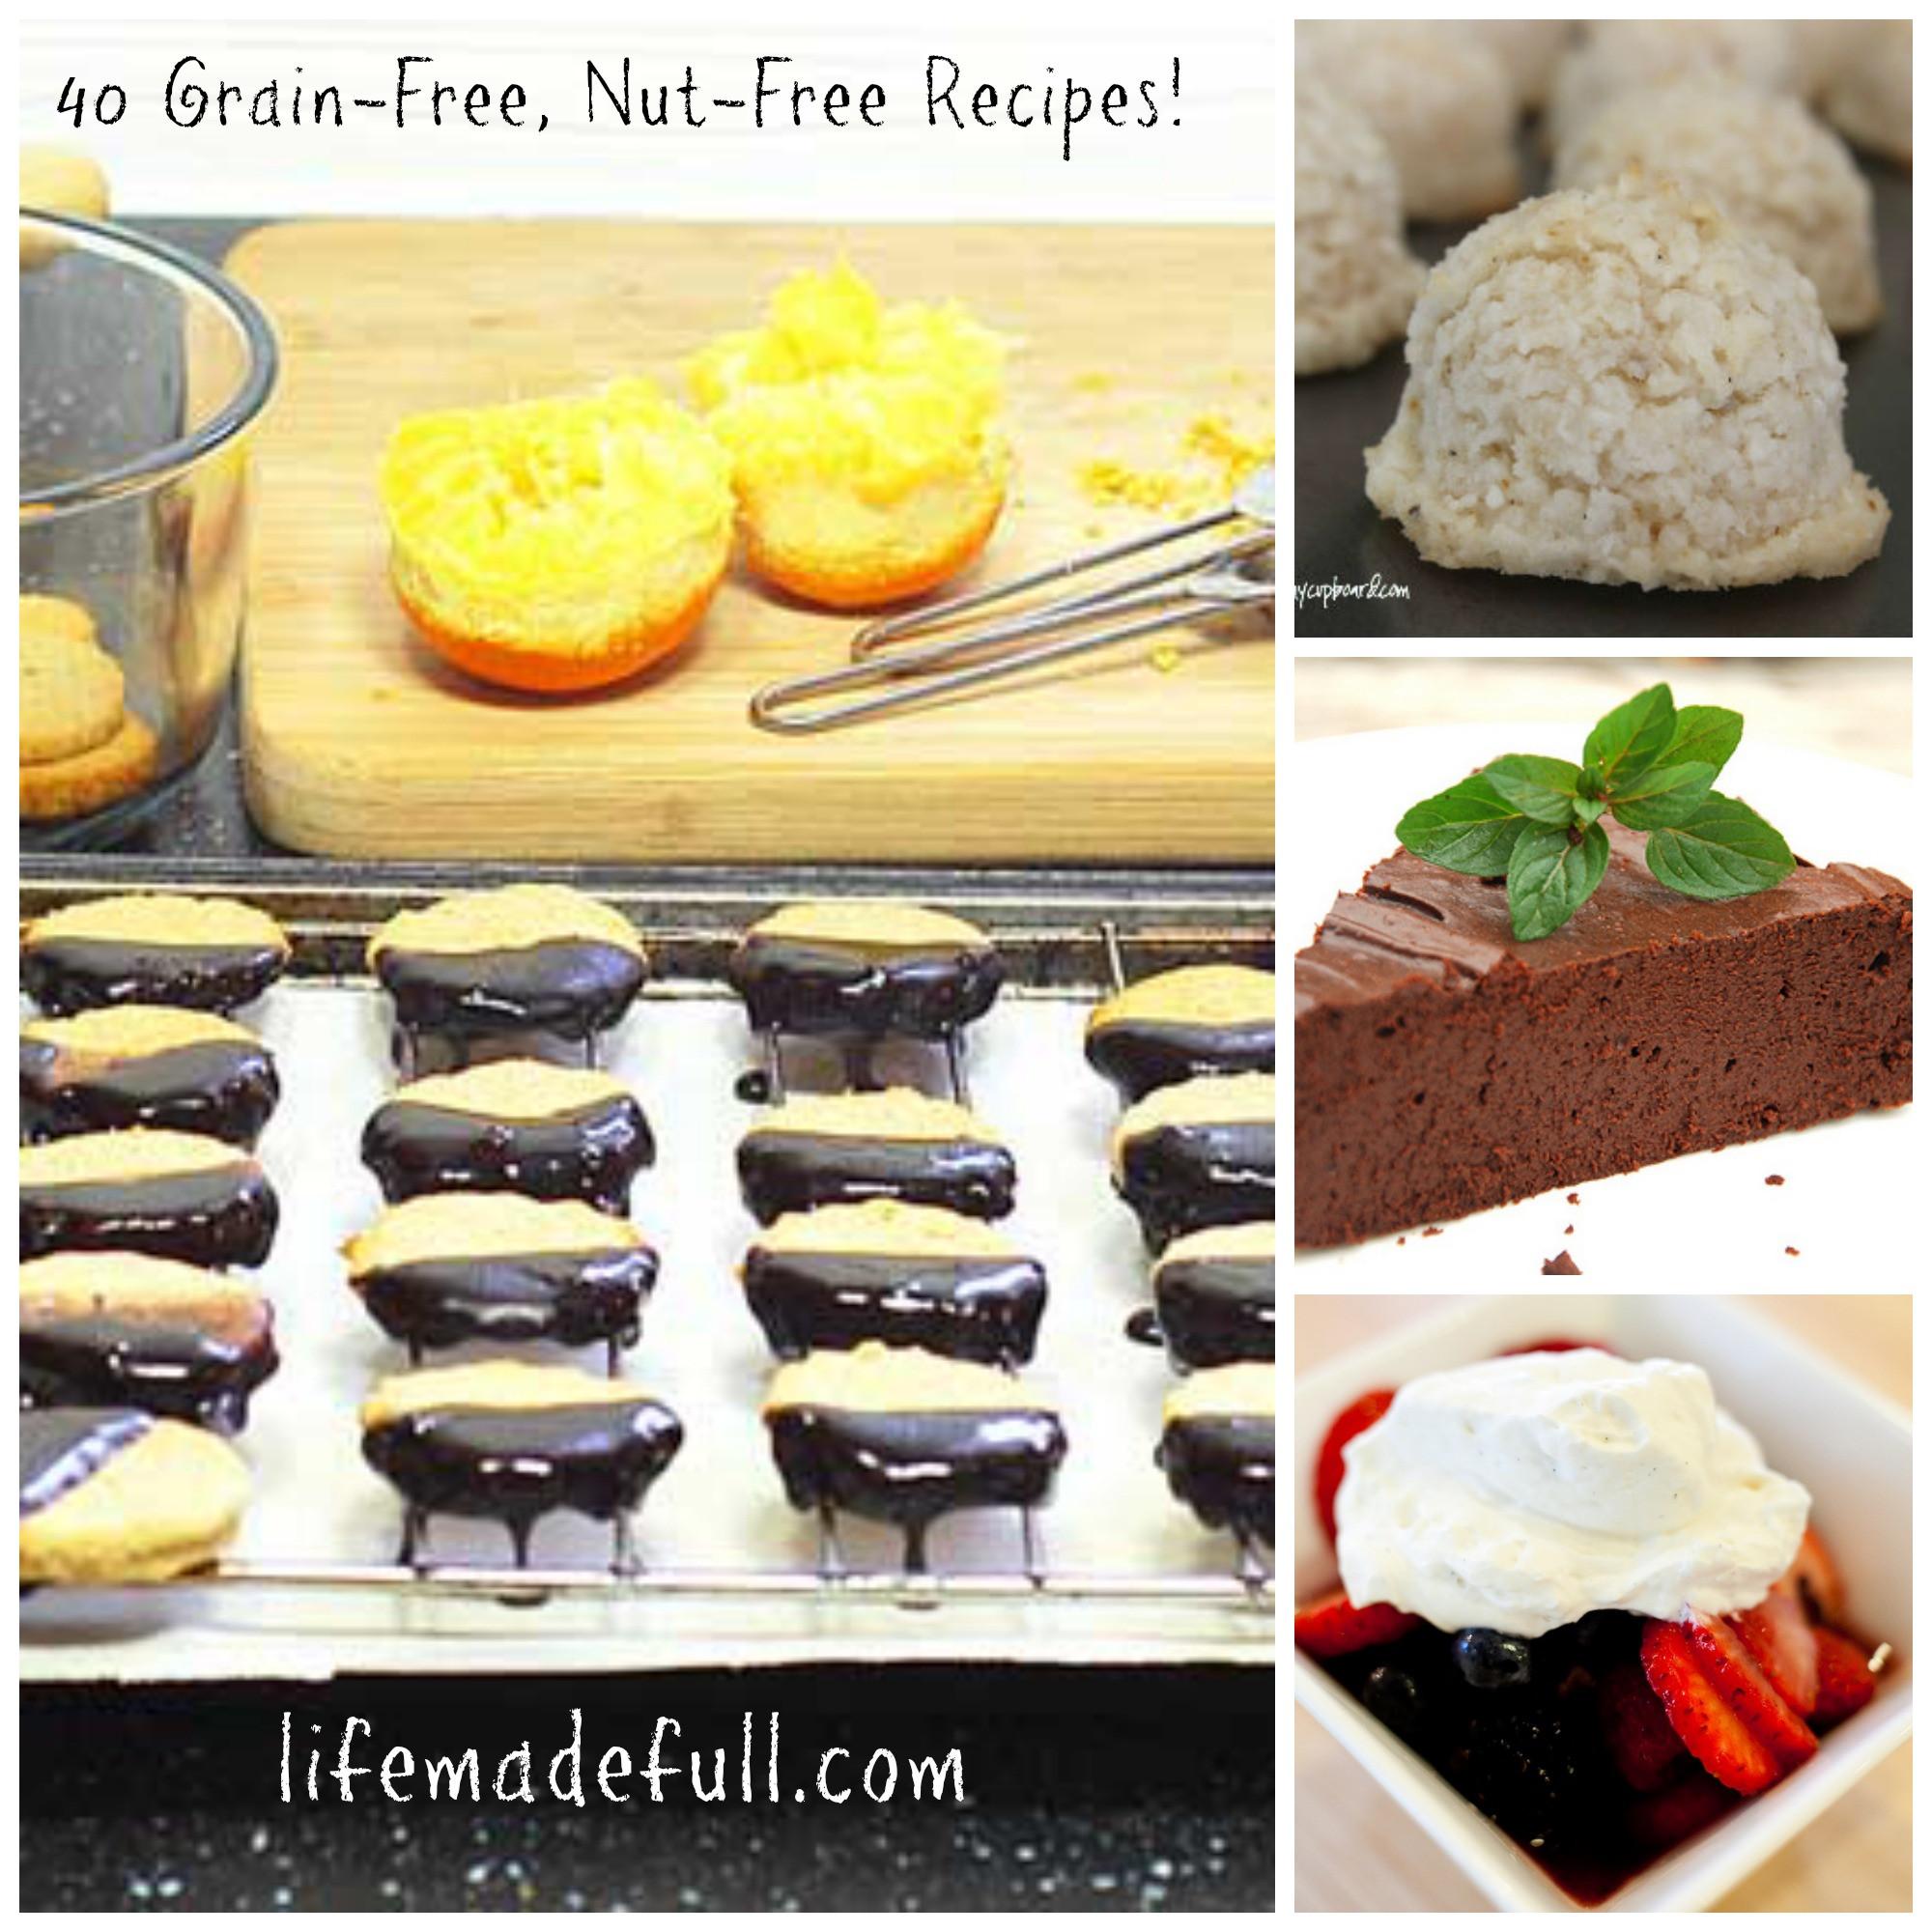 Nut Free Desserts  40 Grain Free Nut Free Desserts Life Made Full